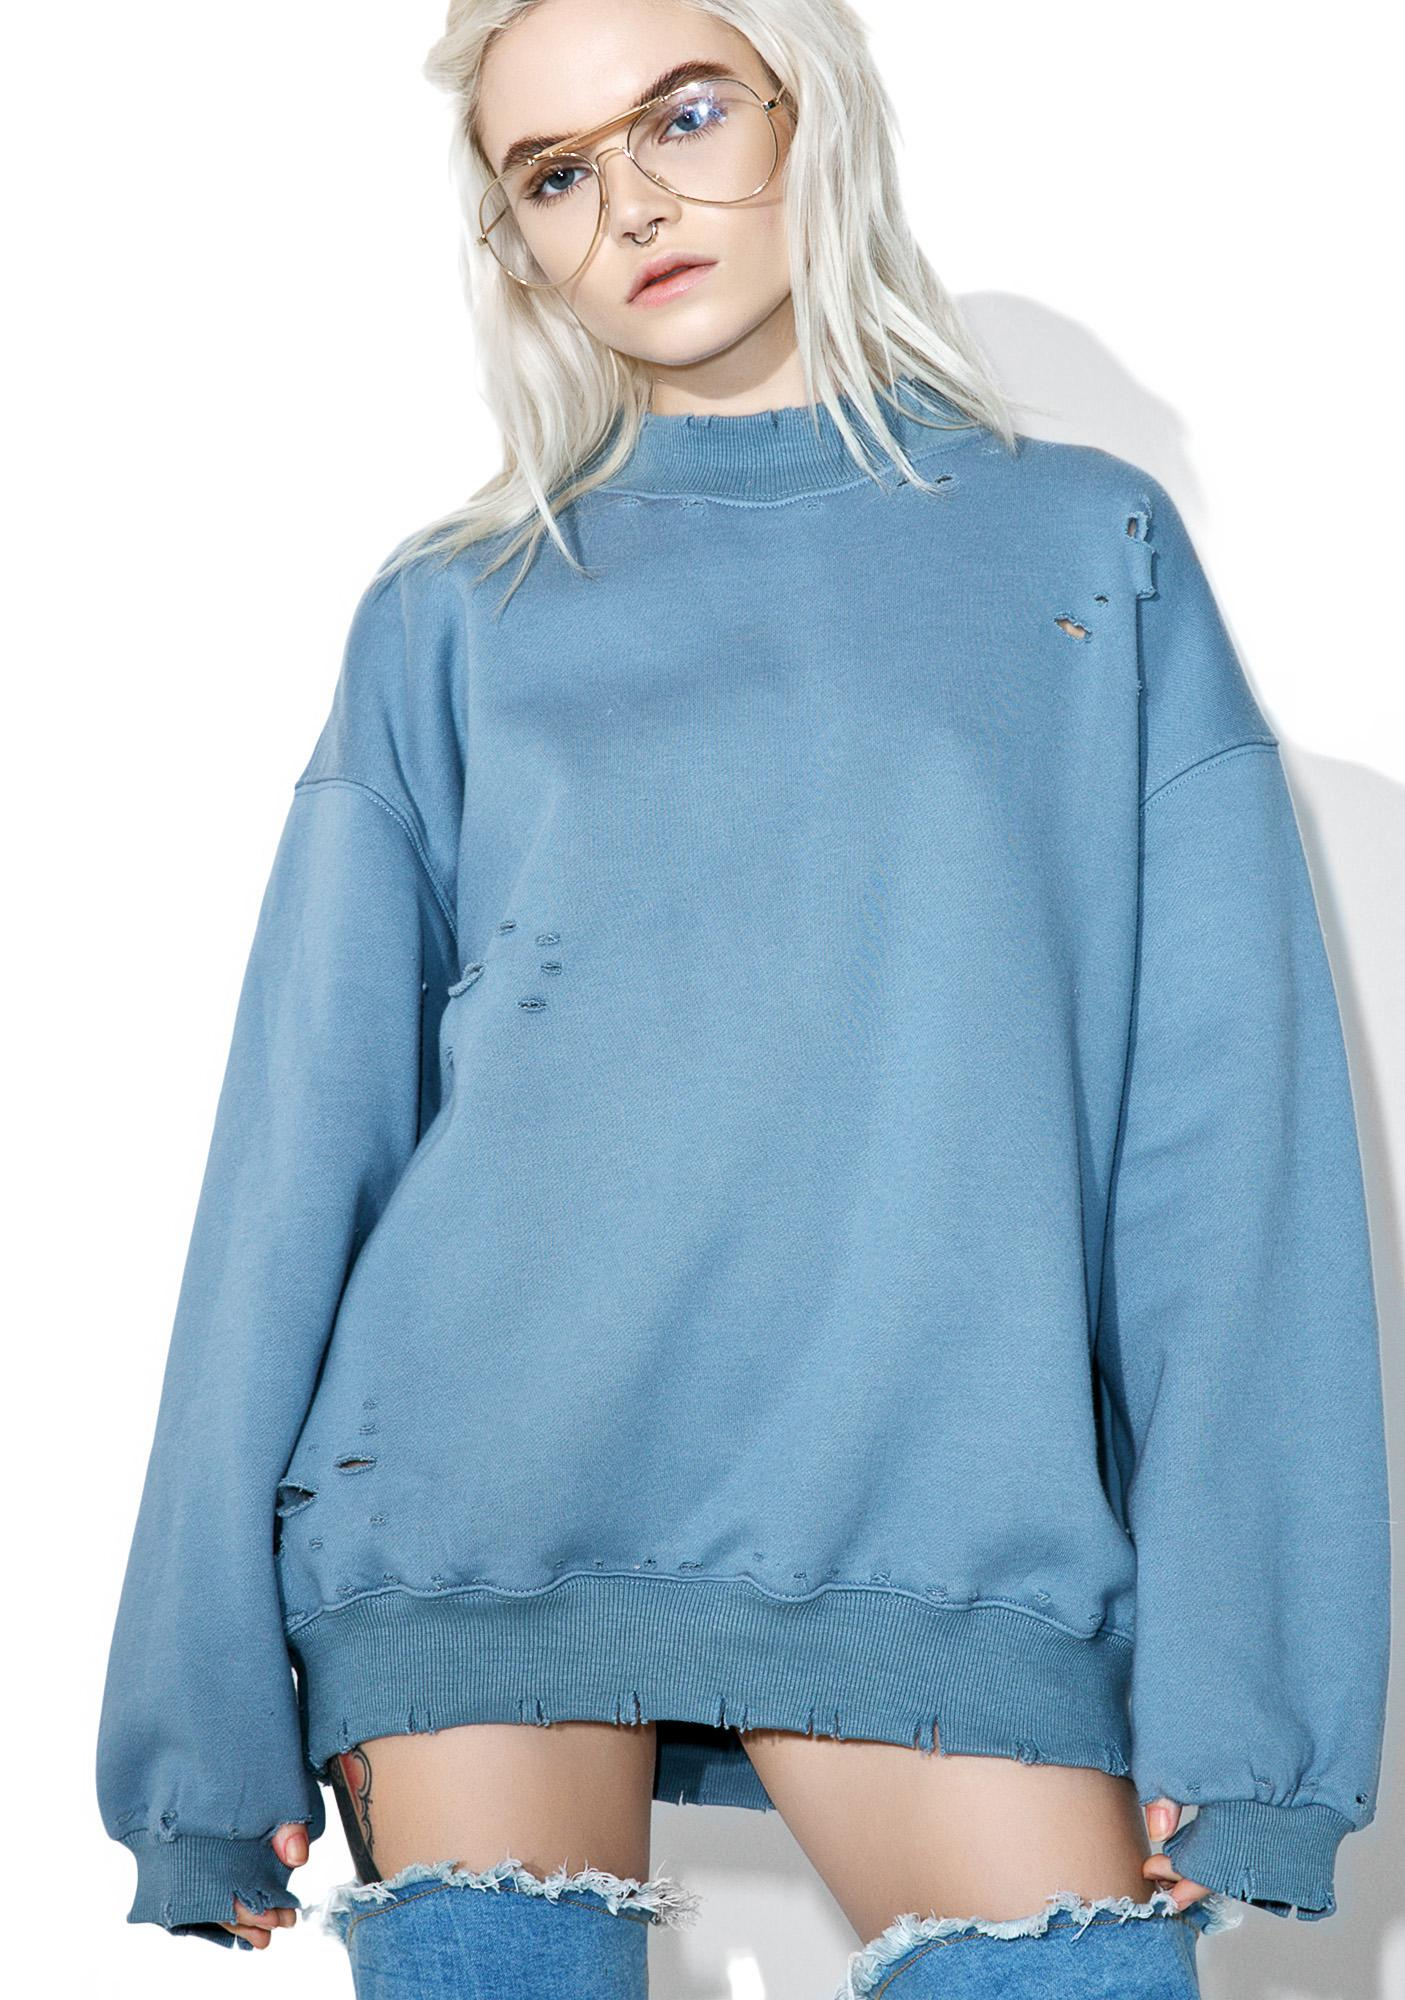 Fade Away Distressed Sweatshirt